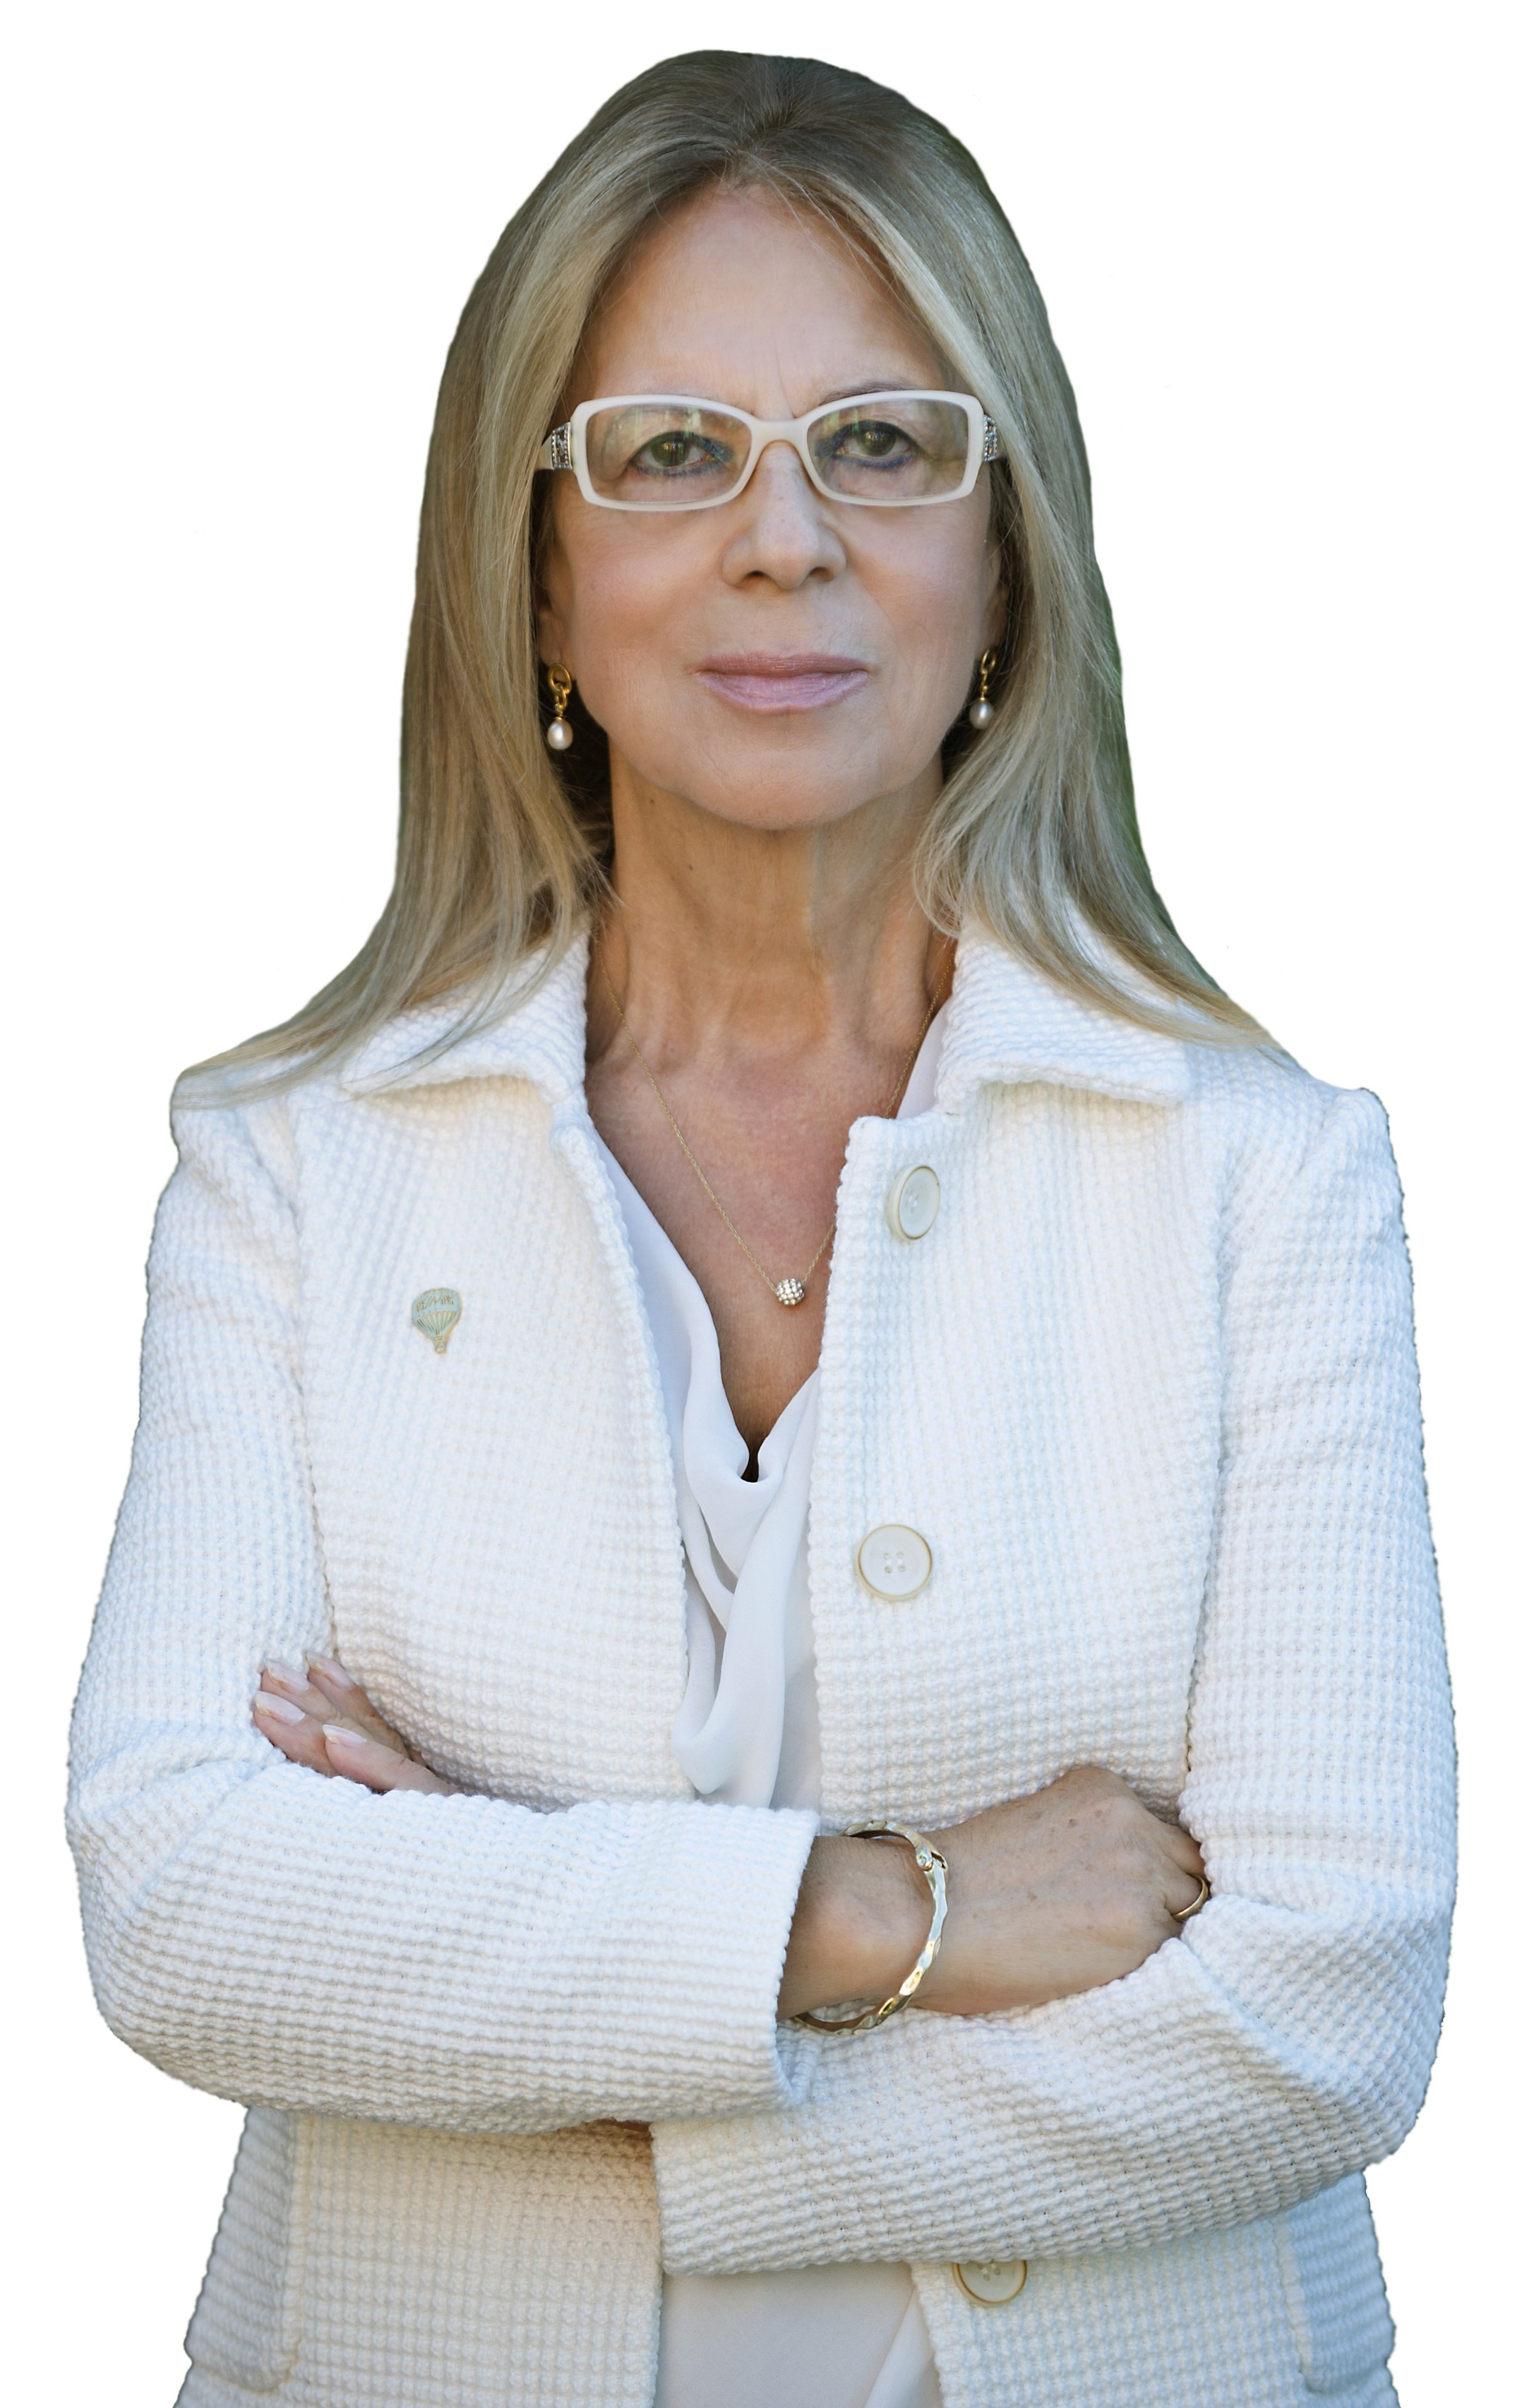 Mª Nieves Quicler Carballido